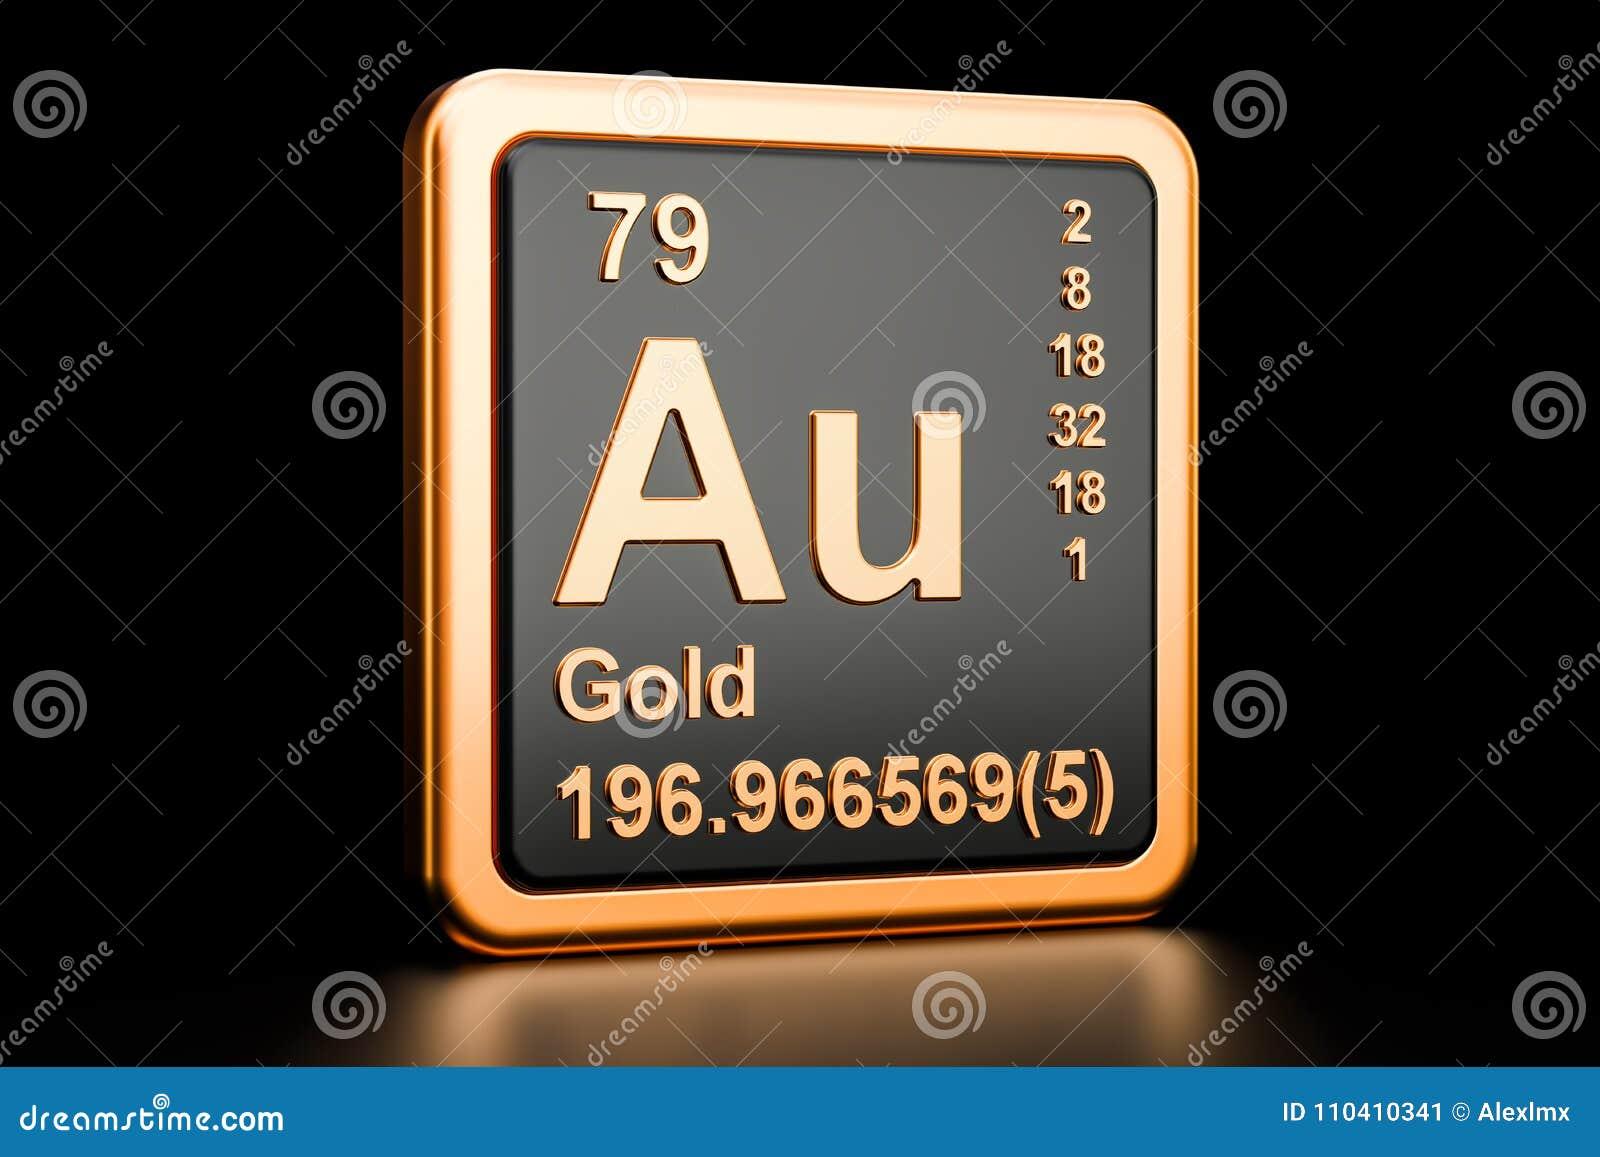 Gold Aurum Au Chemical Element 3d Rendering Stock Illustration